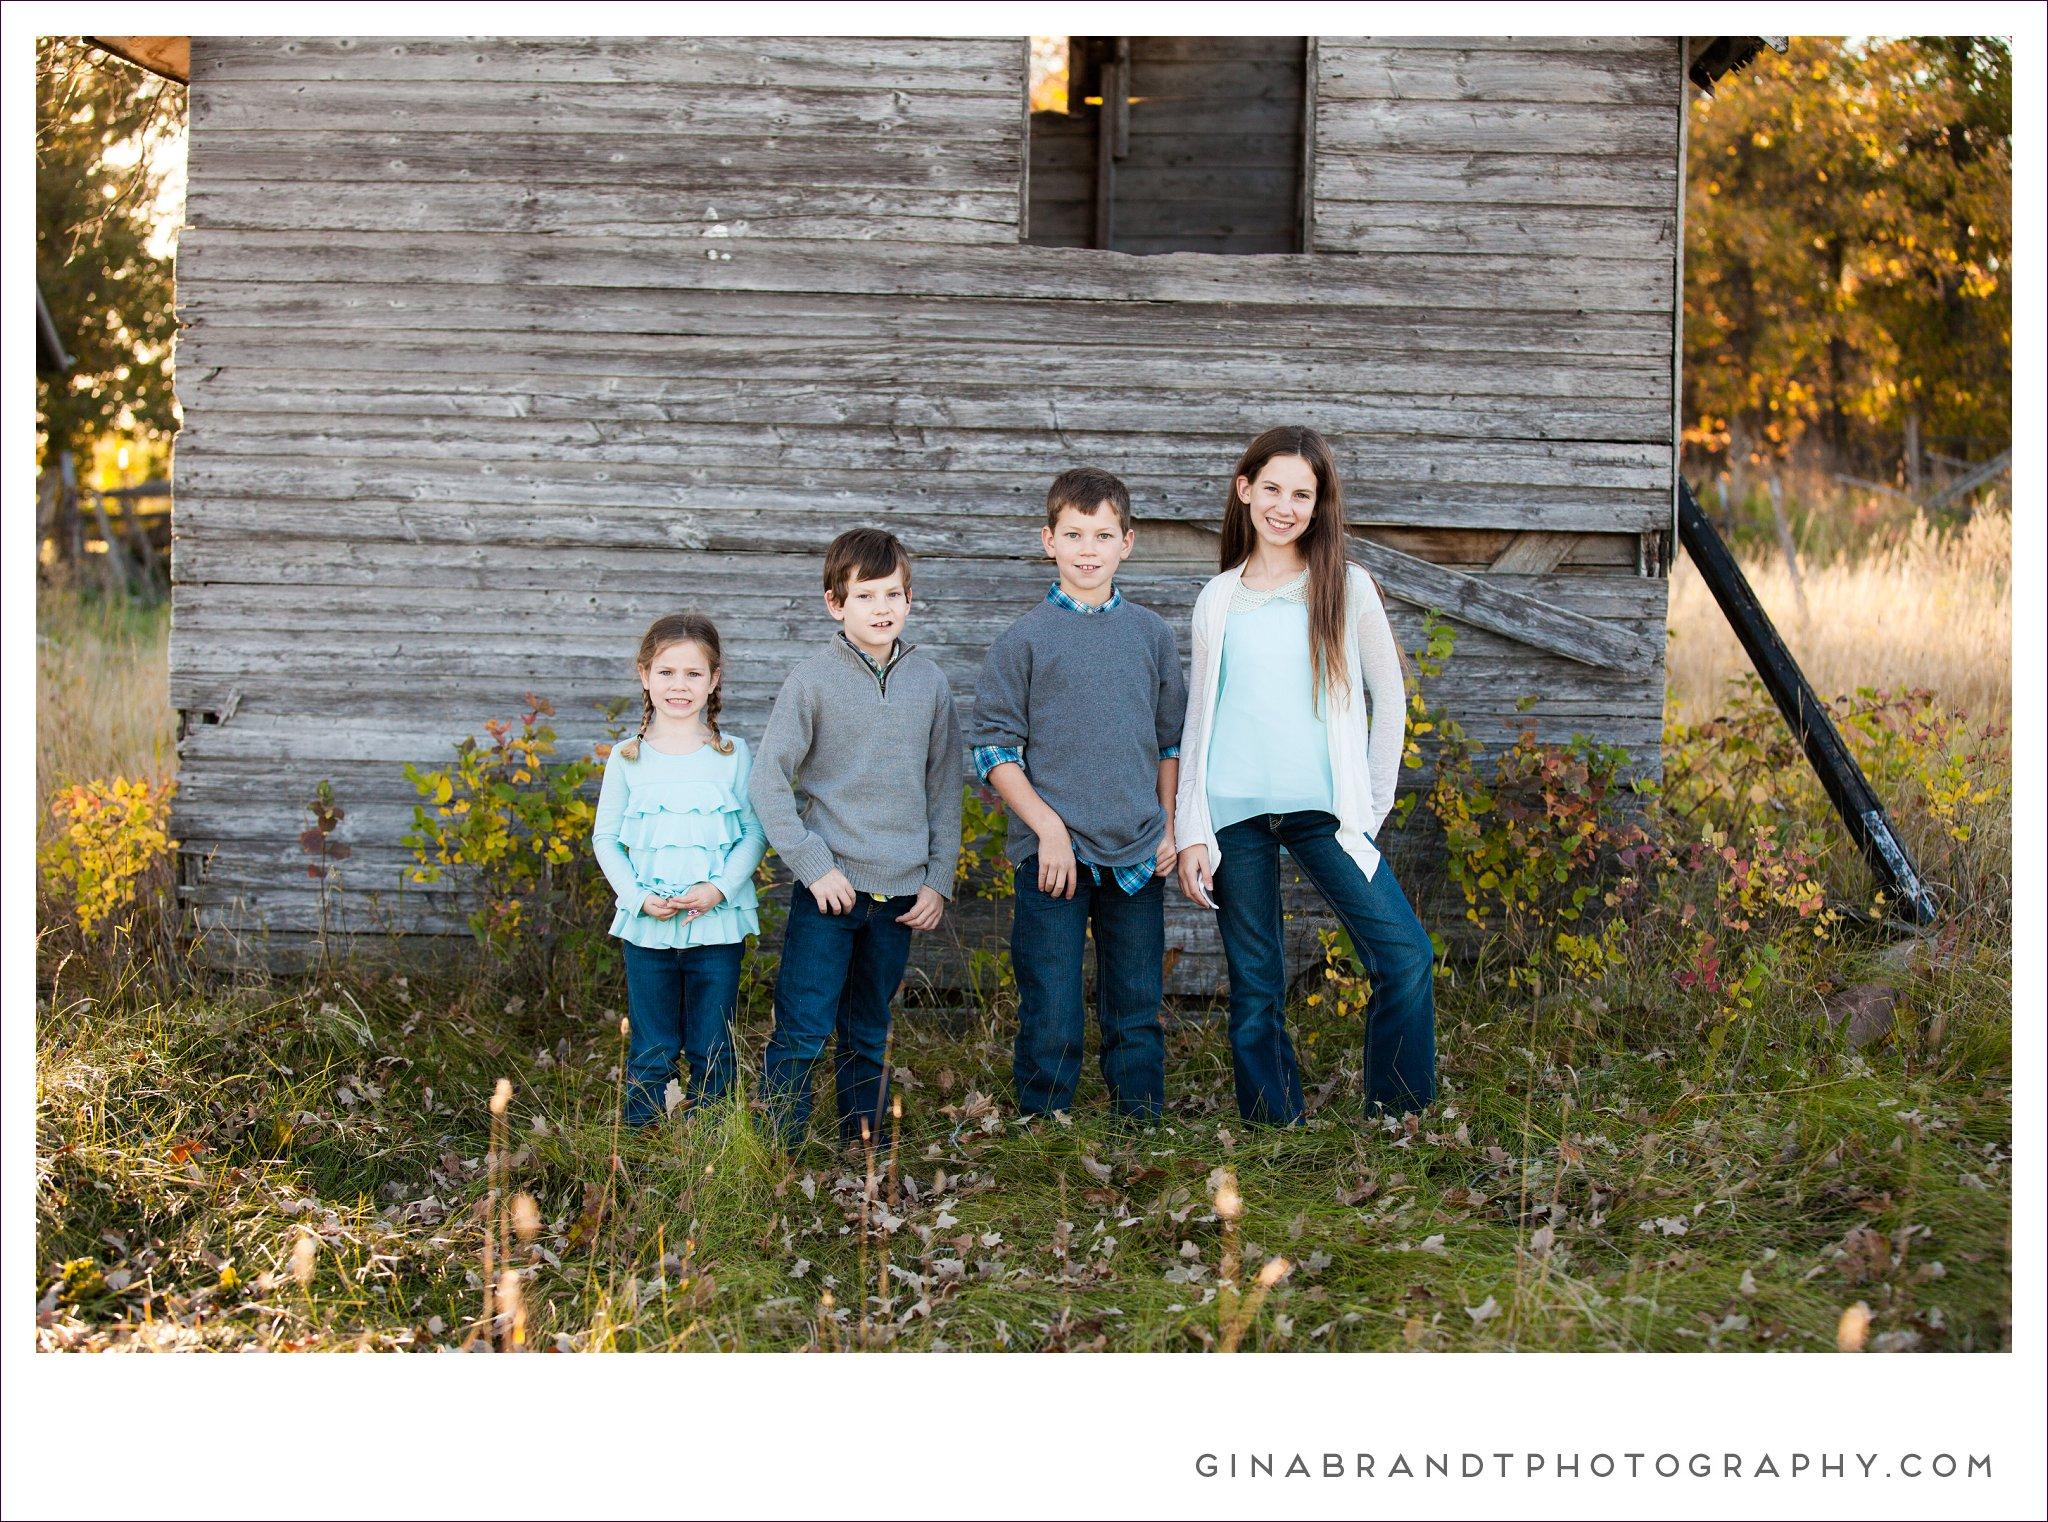 Gina Brandt Photography_0183.jpg